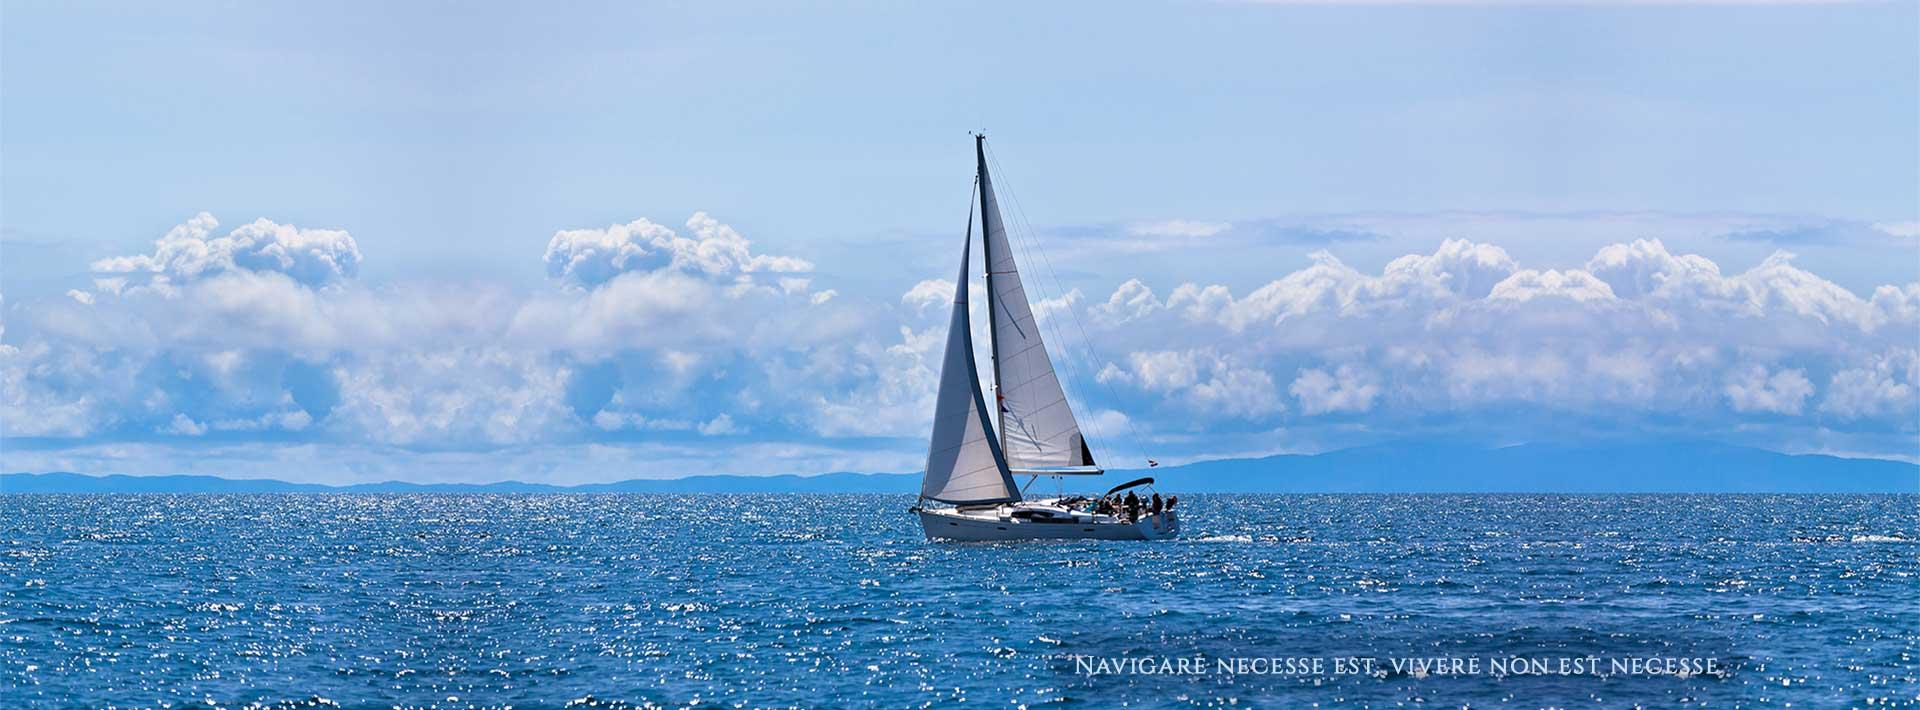 Noutico Novigrad - prodaja plovila, nautička oprema, zimovanje plovila